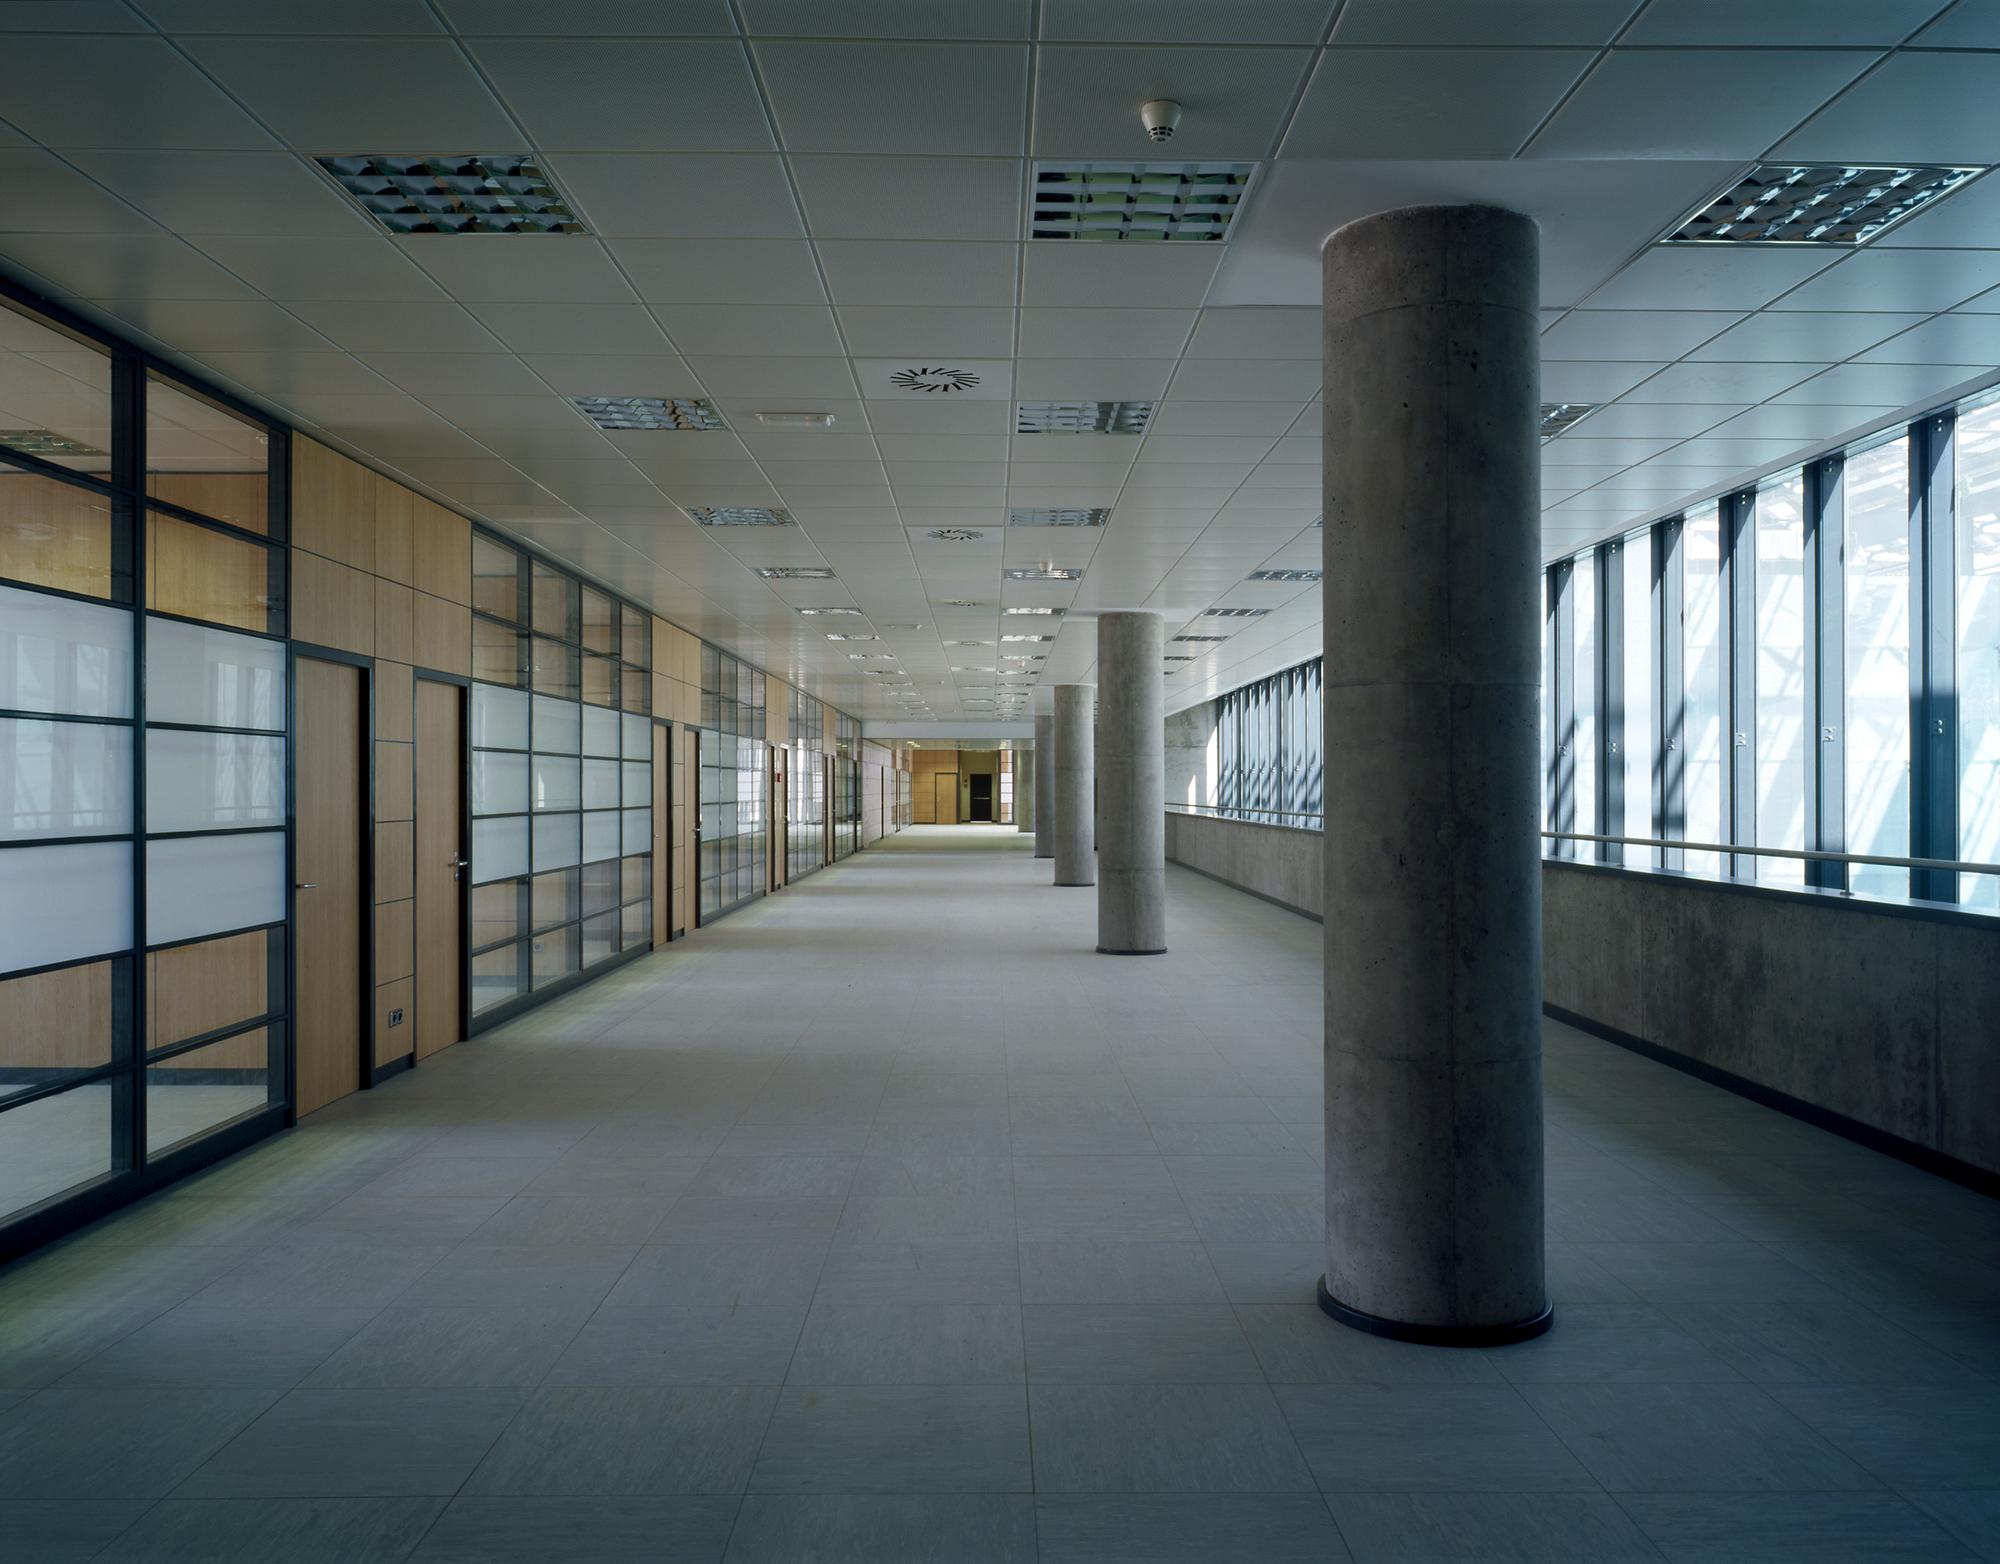 Galer a de oficinas centrales de airbus espa a pablo notari oviedo sumar urbanismo - Oficinas telecable oviedo ...